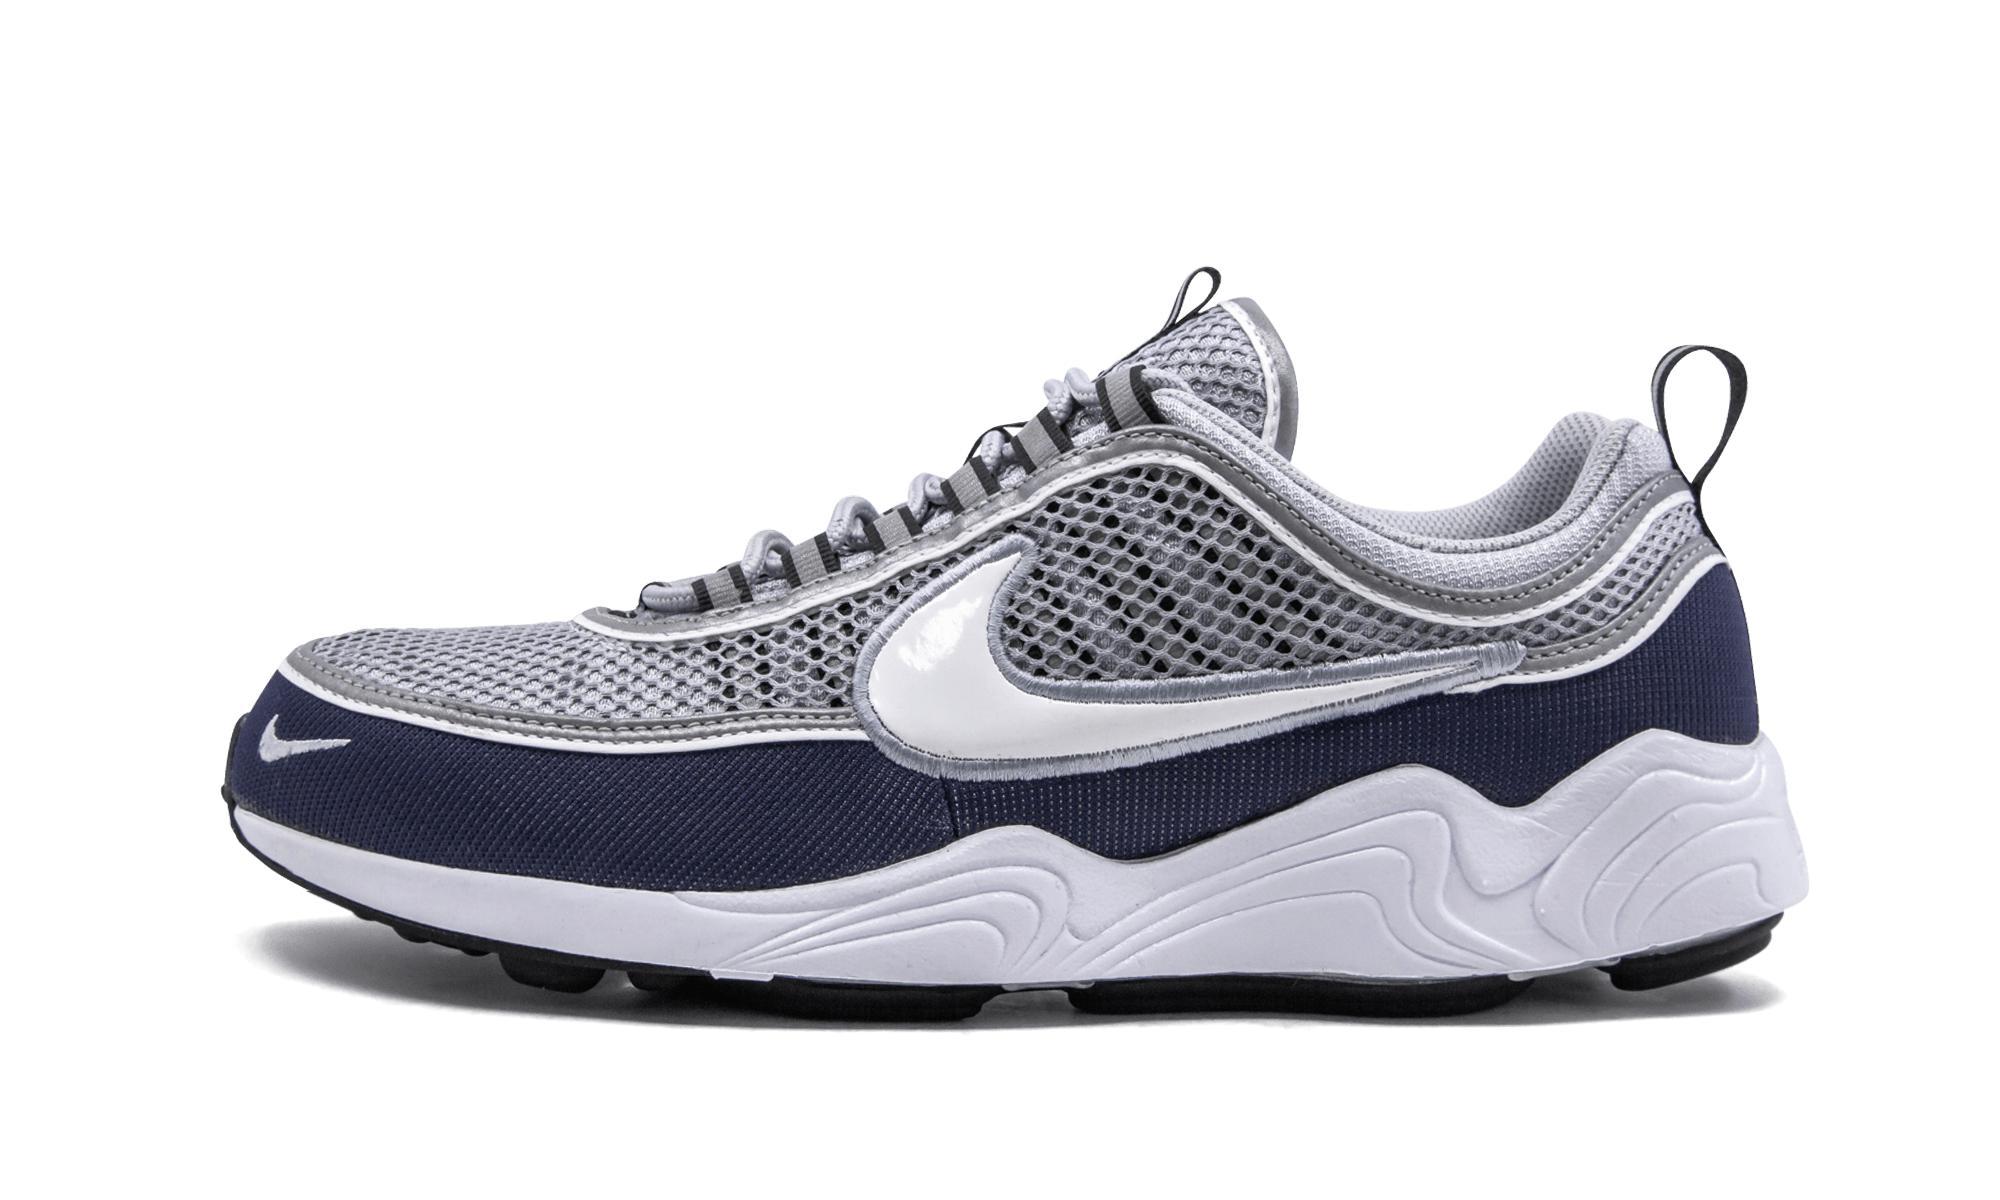 67414a40416e6 Lyst - Nike Air Zoom Spiridon  16 in Gray for Men